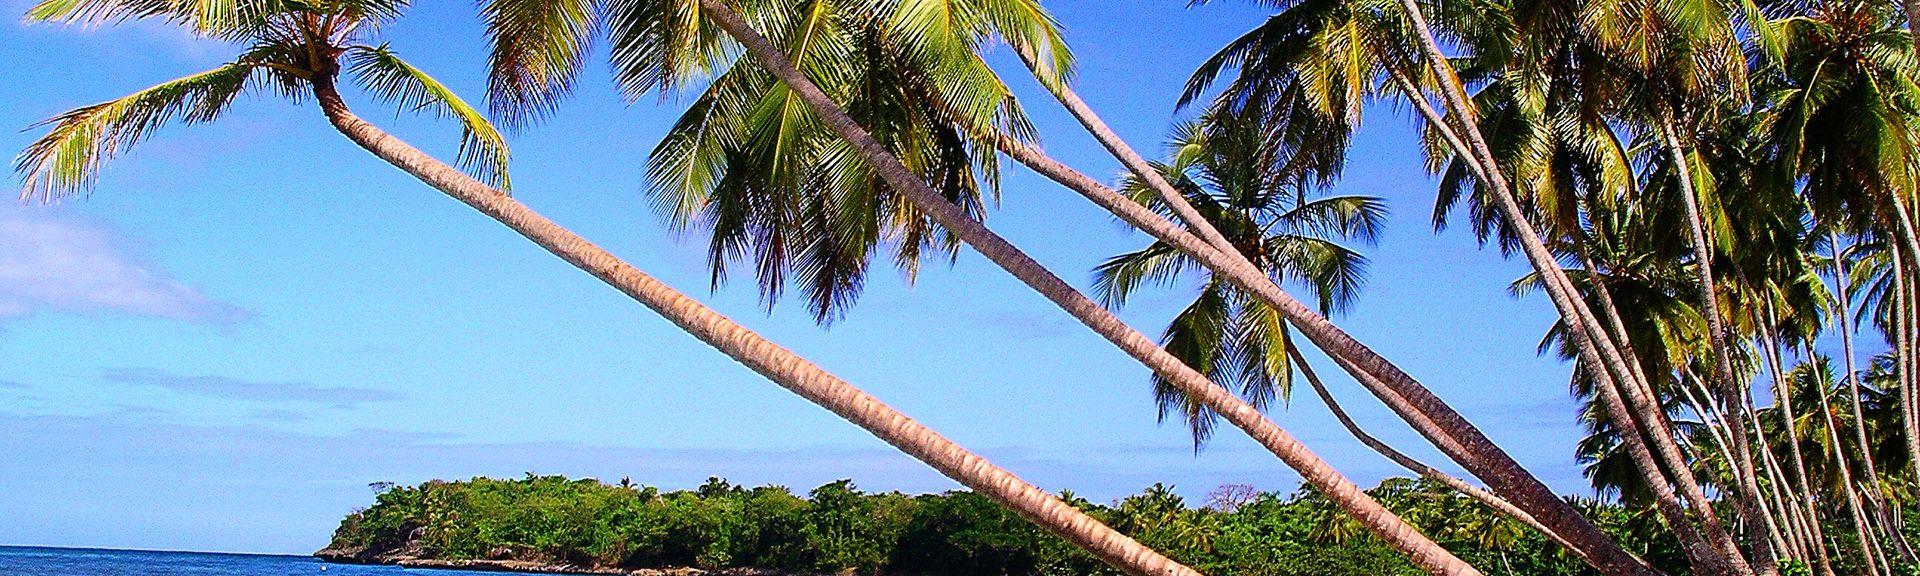 Bas Vent, Guadeloupe